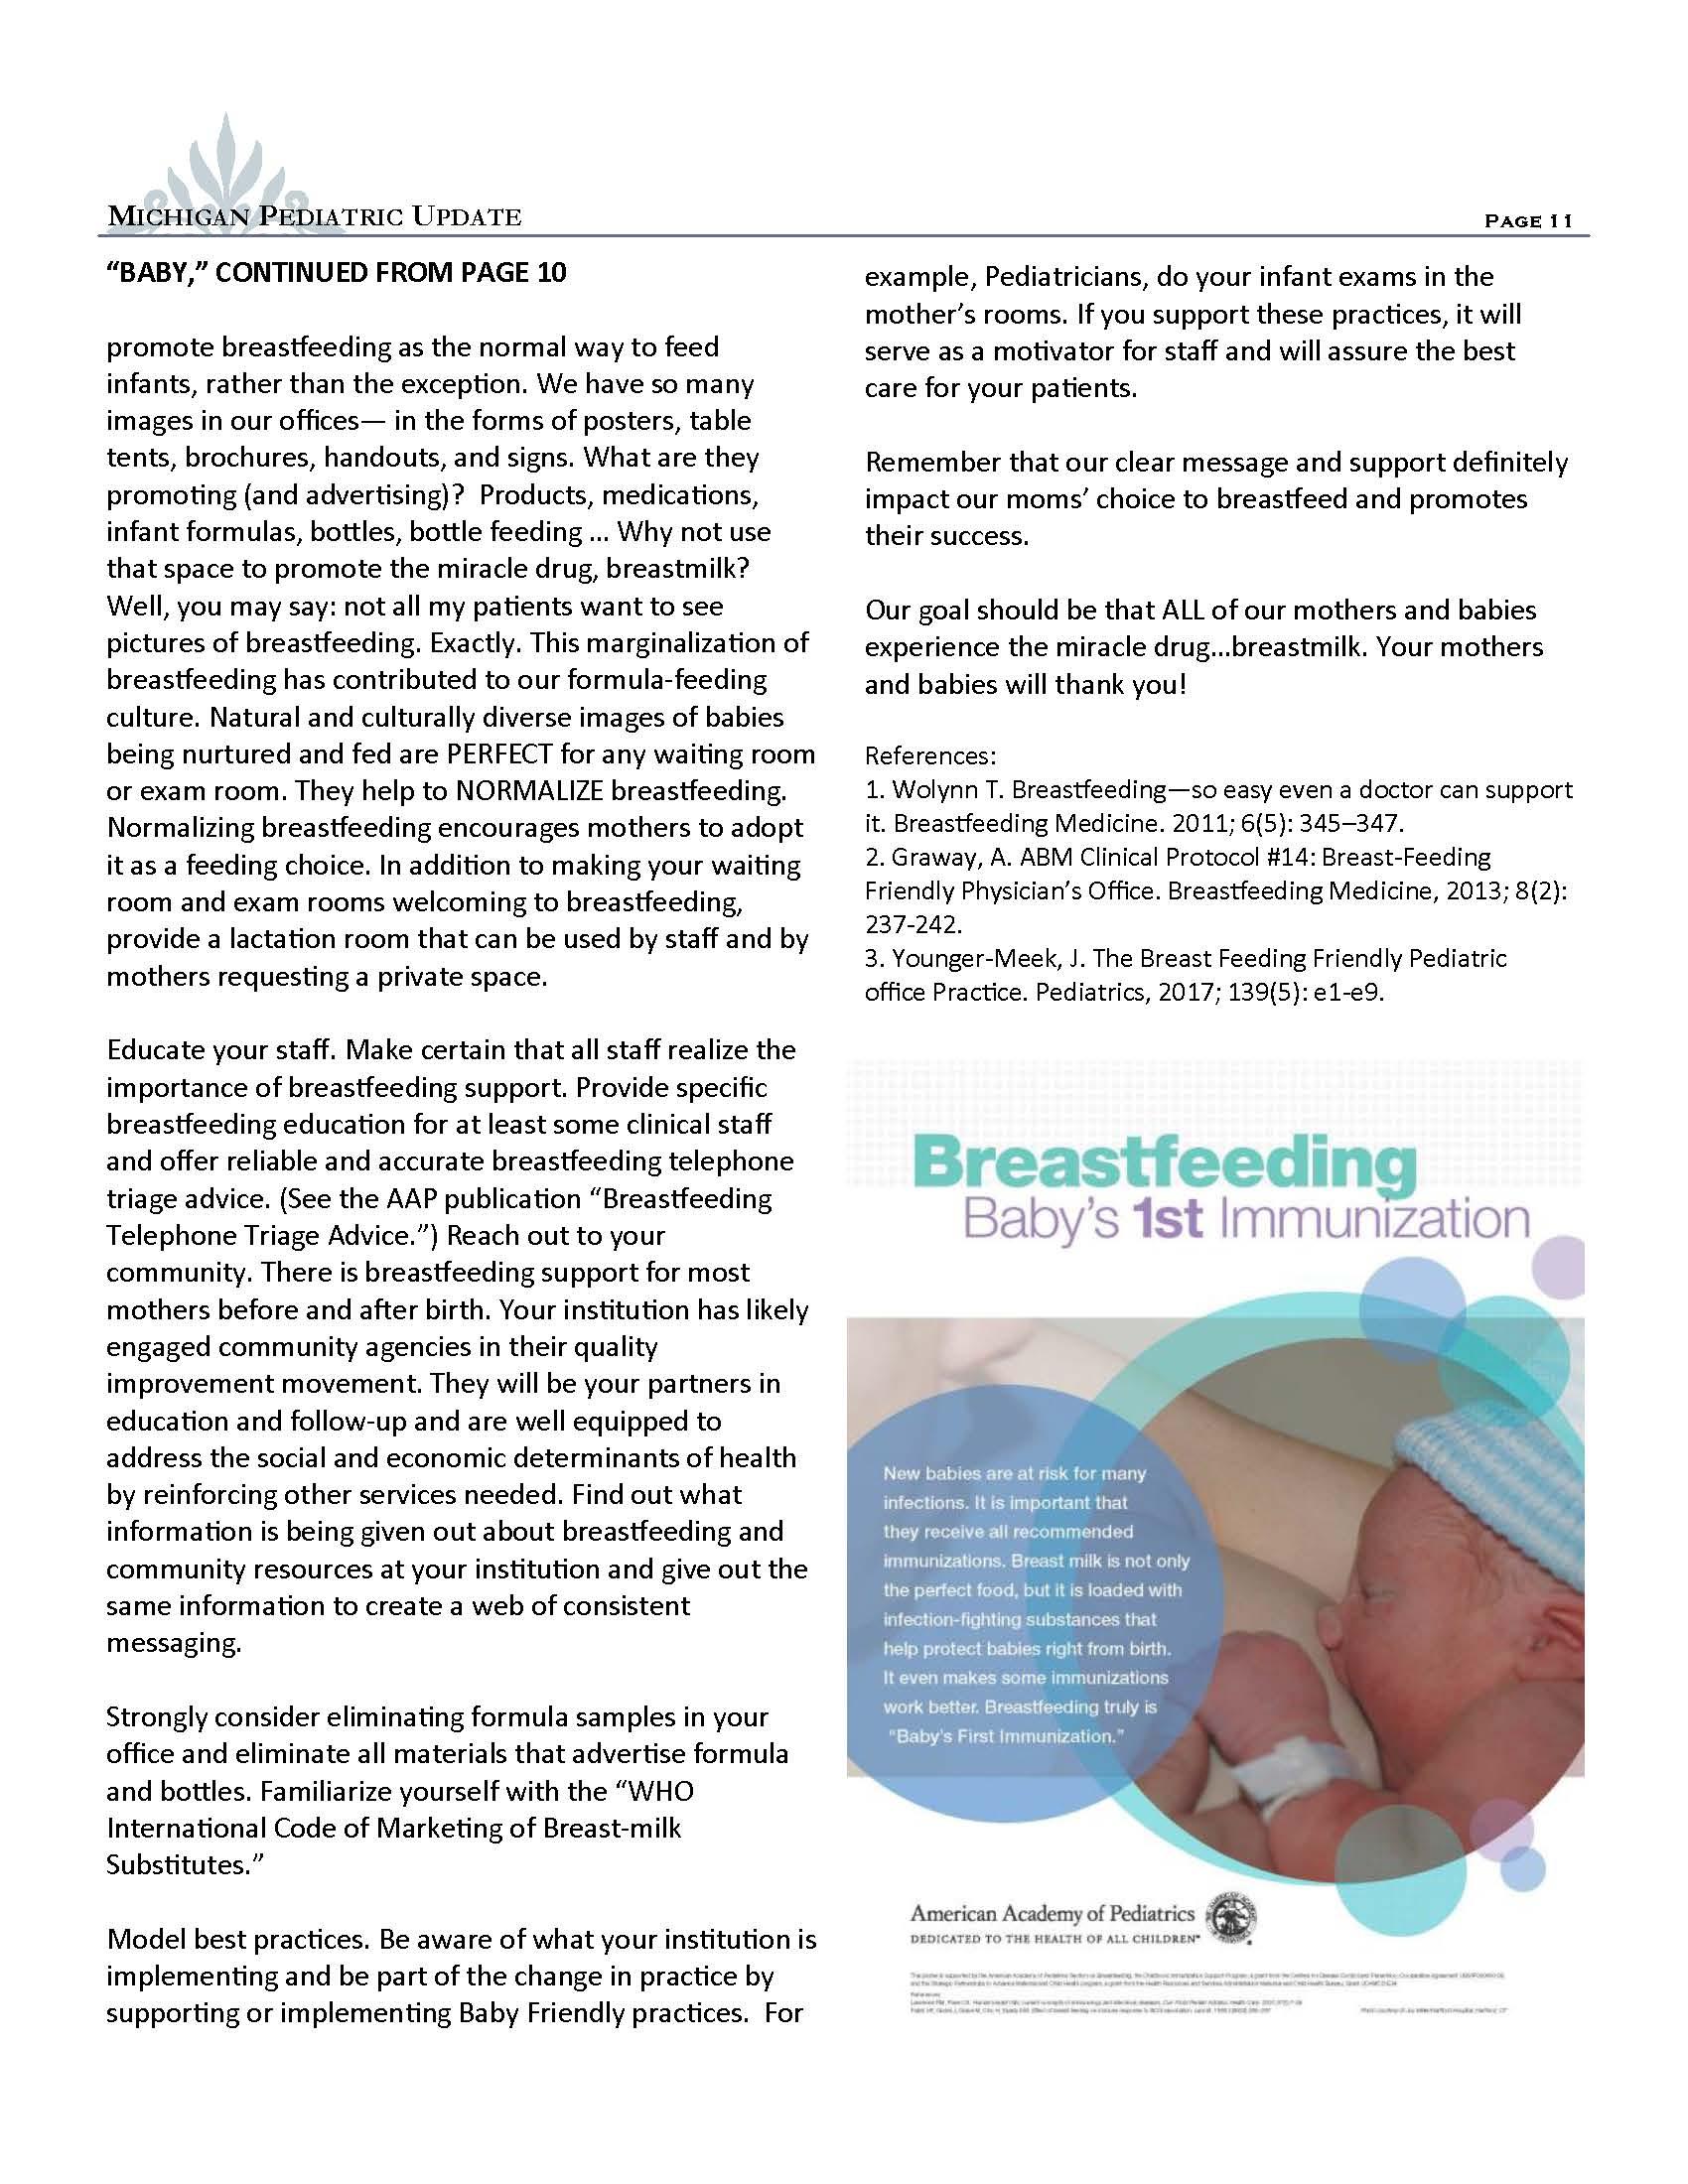 Printed Newsletter_November2017_Page_11.jpg